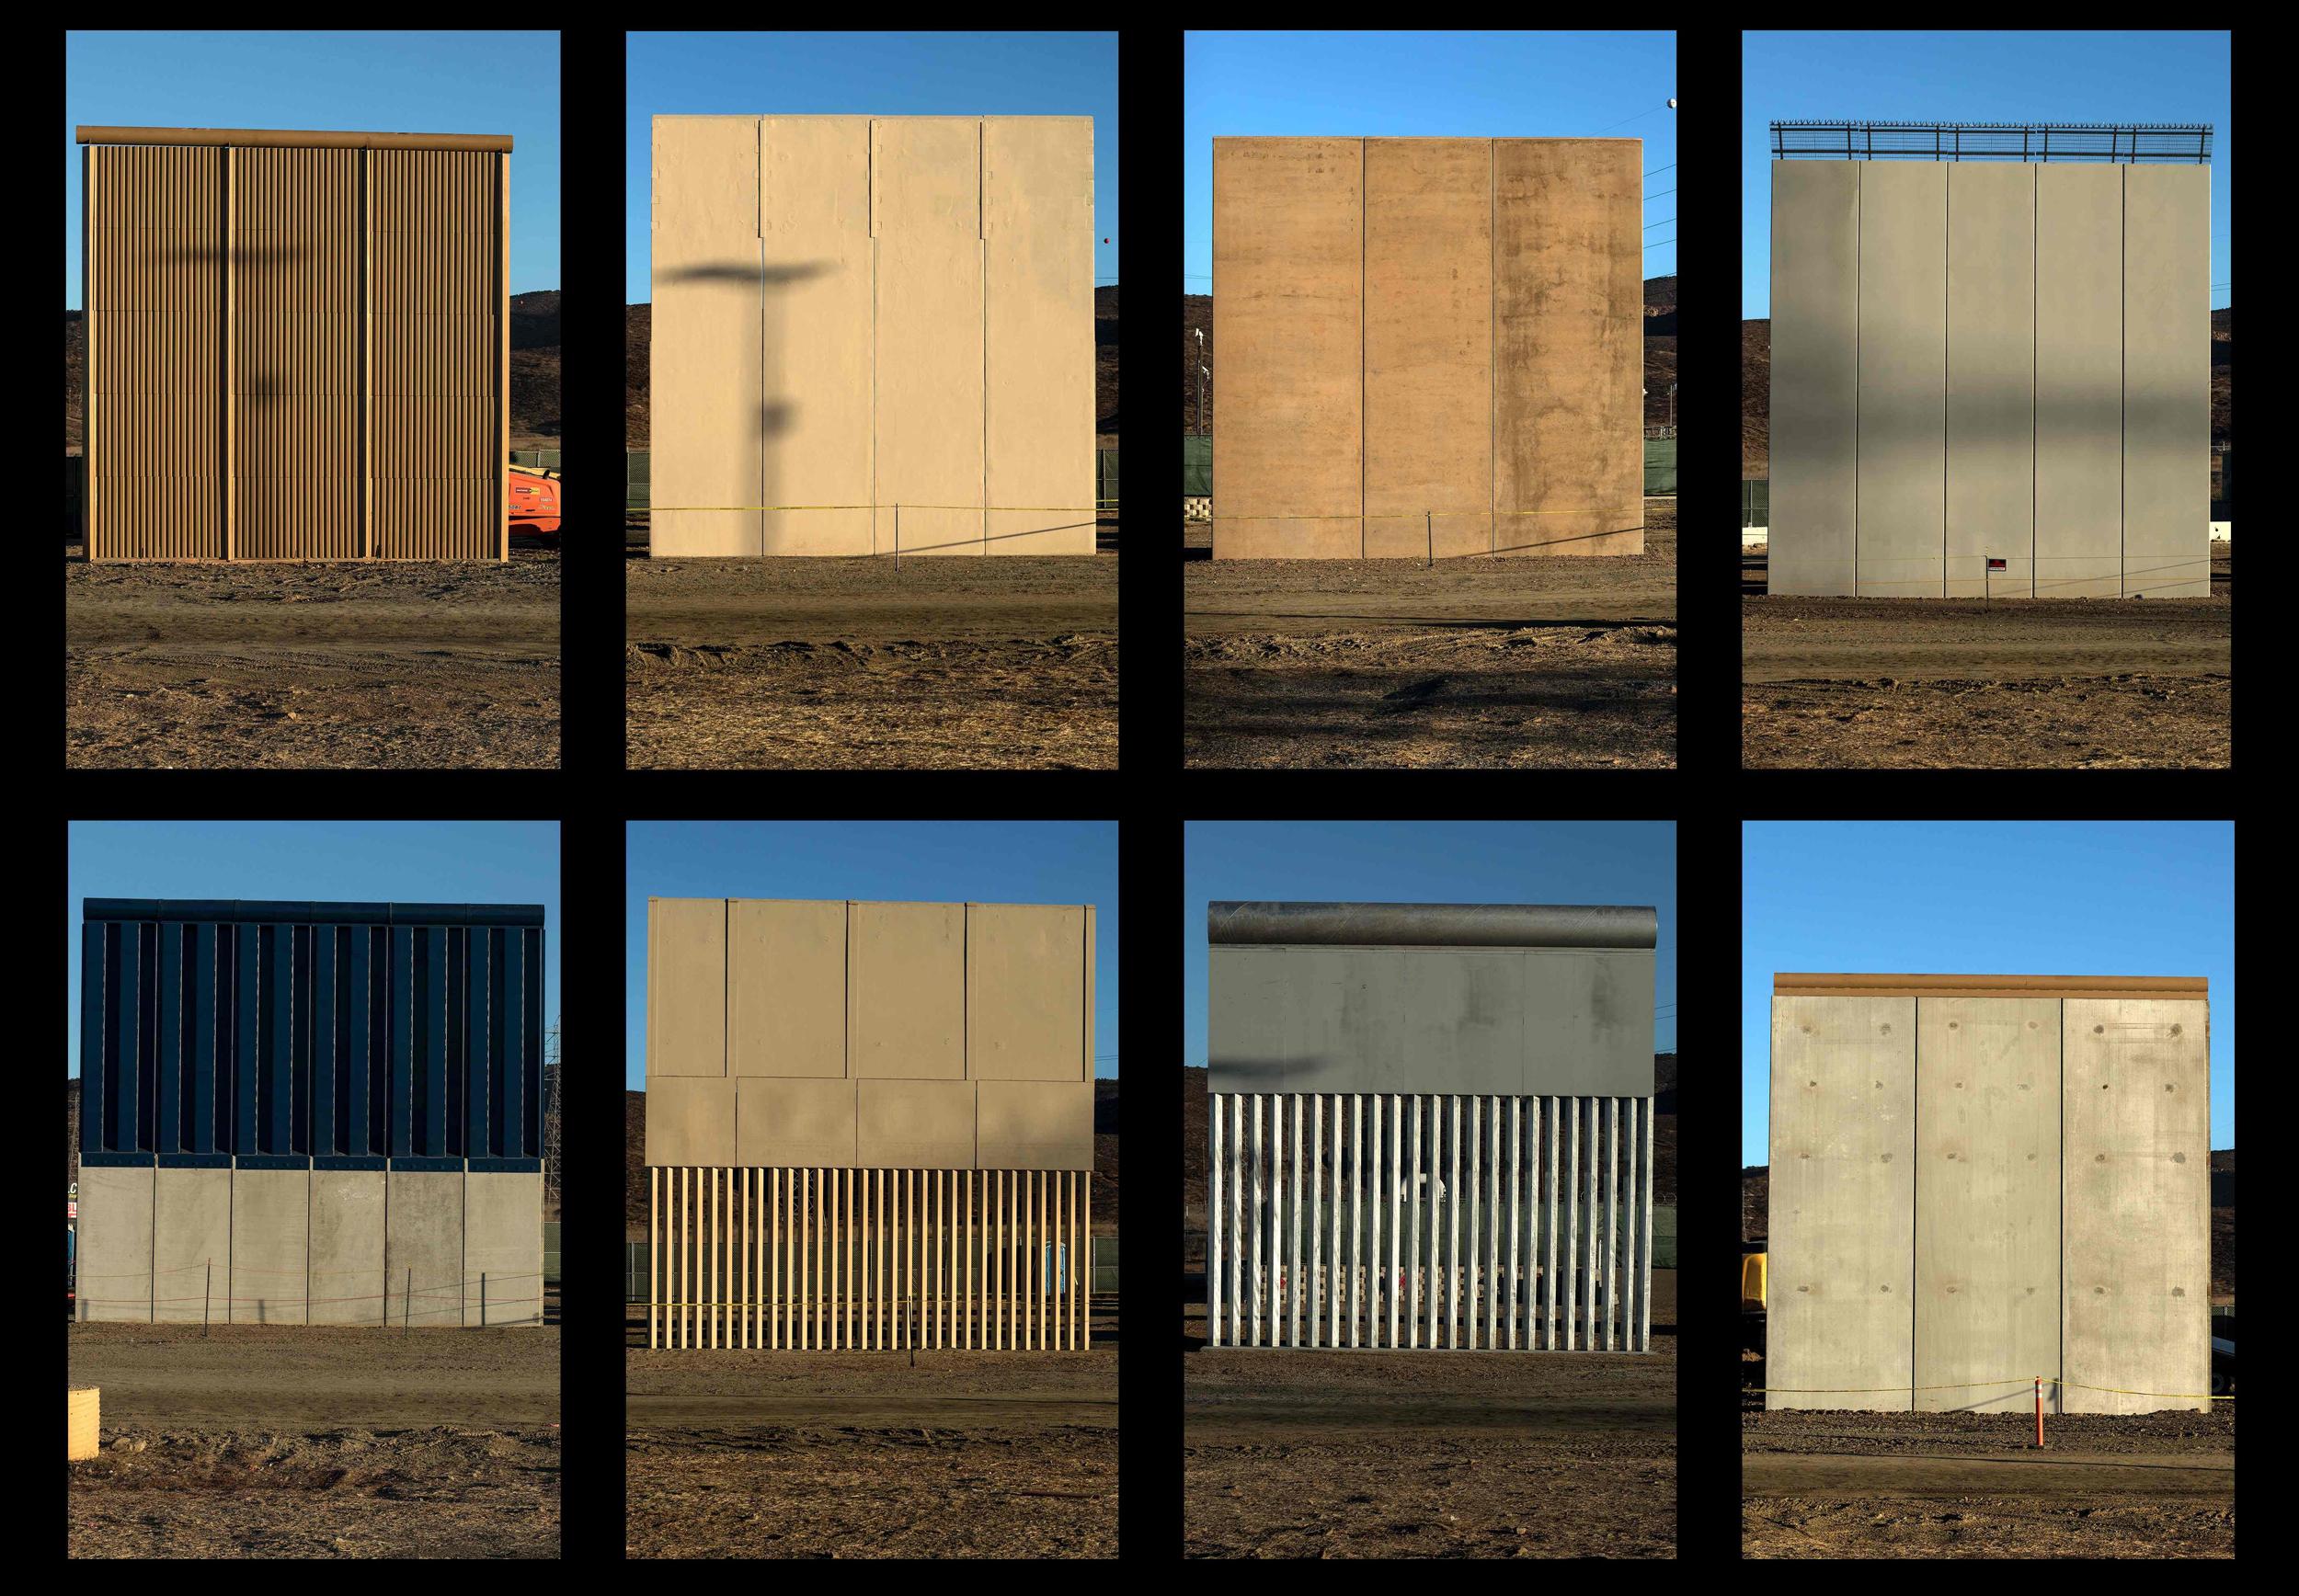 Image: The eight prototypes of President Donald Trump's U.S.-Mexico border wall near San Diego